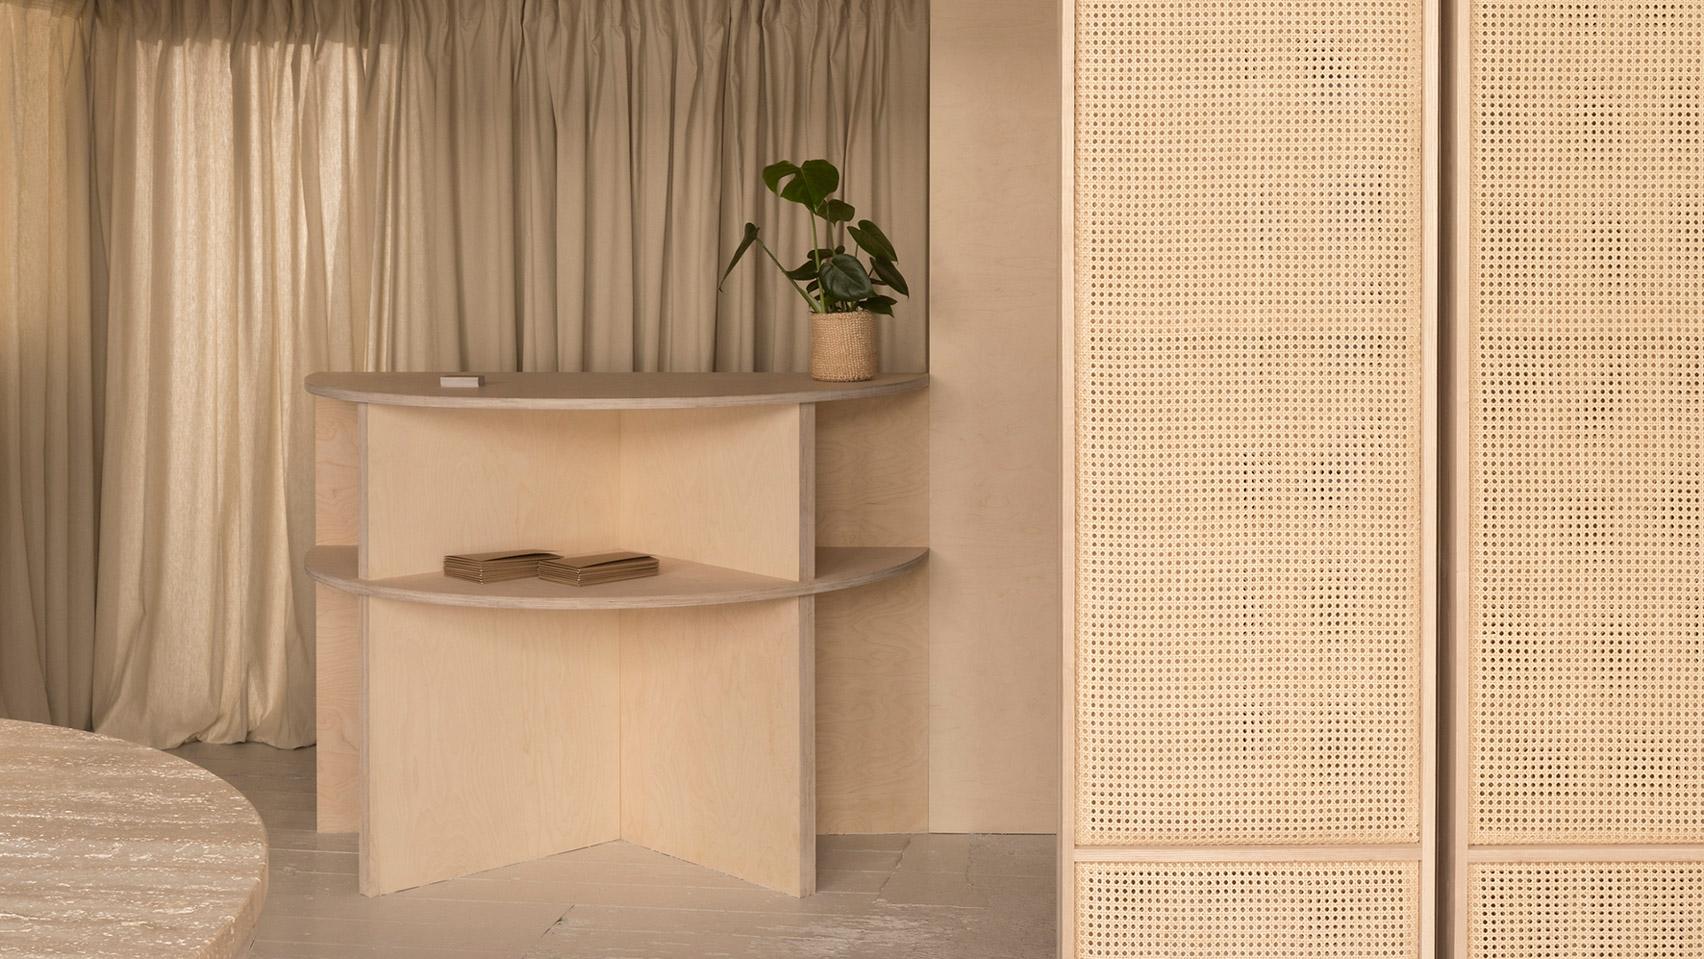 Dezeen's top shop interiors of 2018: RÖ Skin by O'Sullivan Skoufoglou Architects